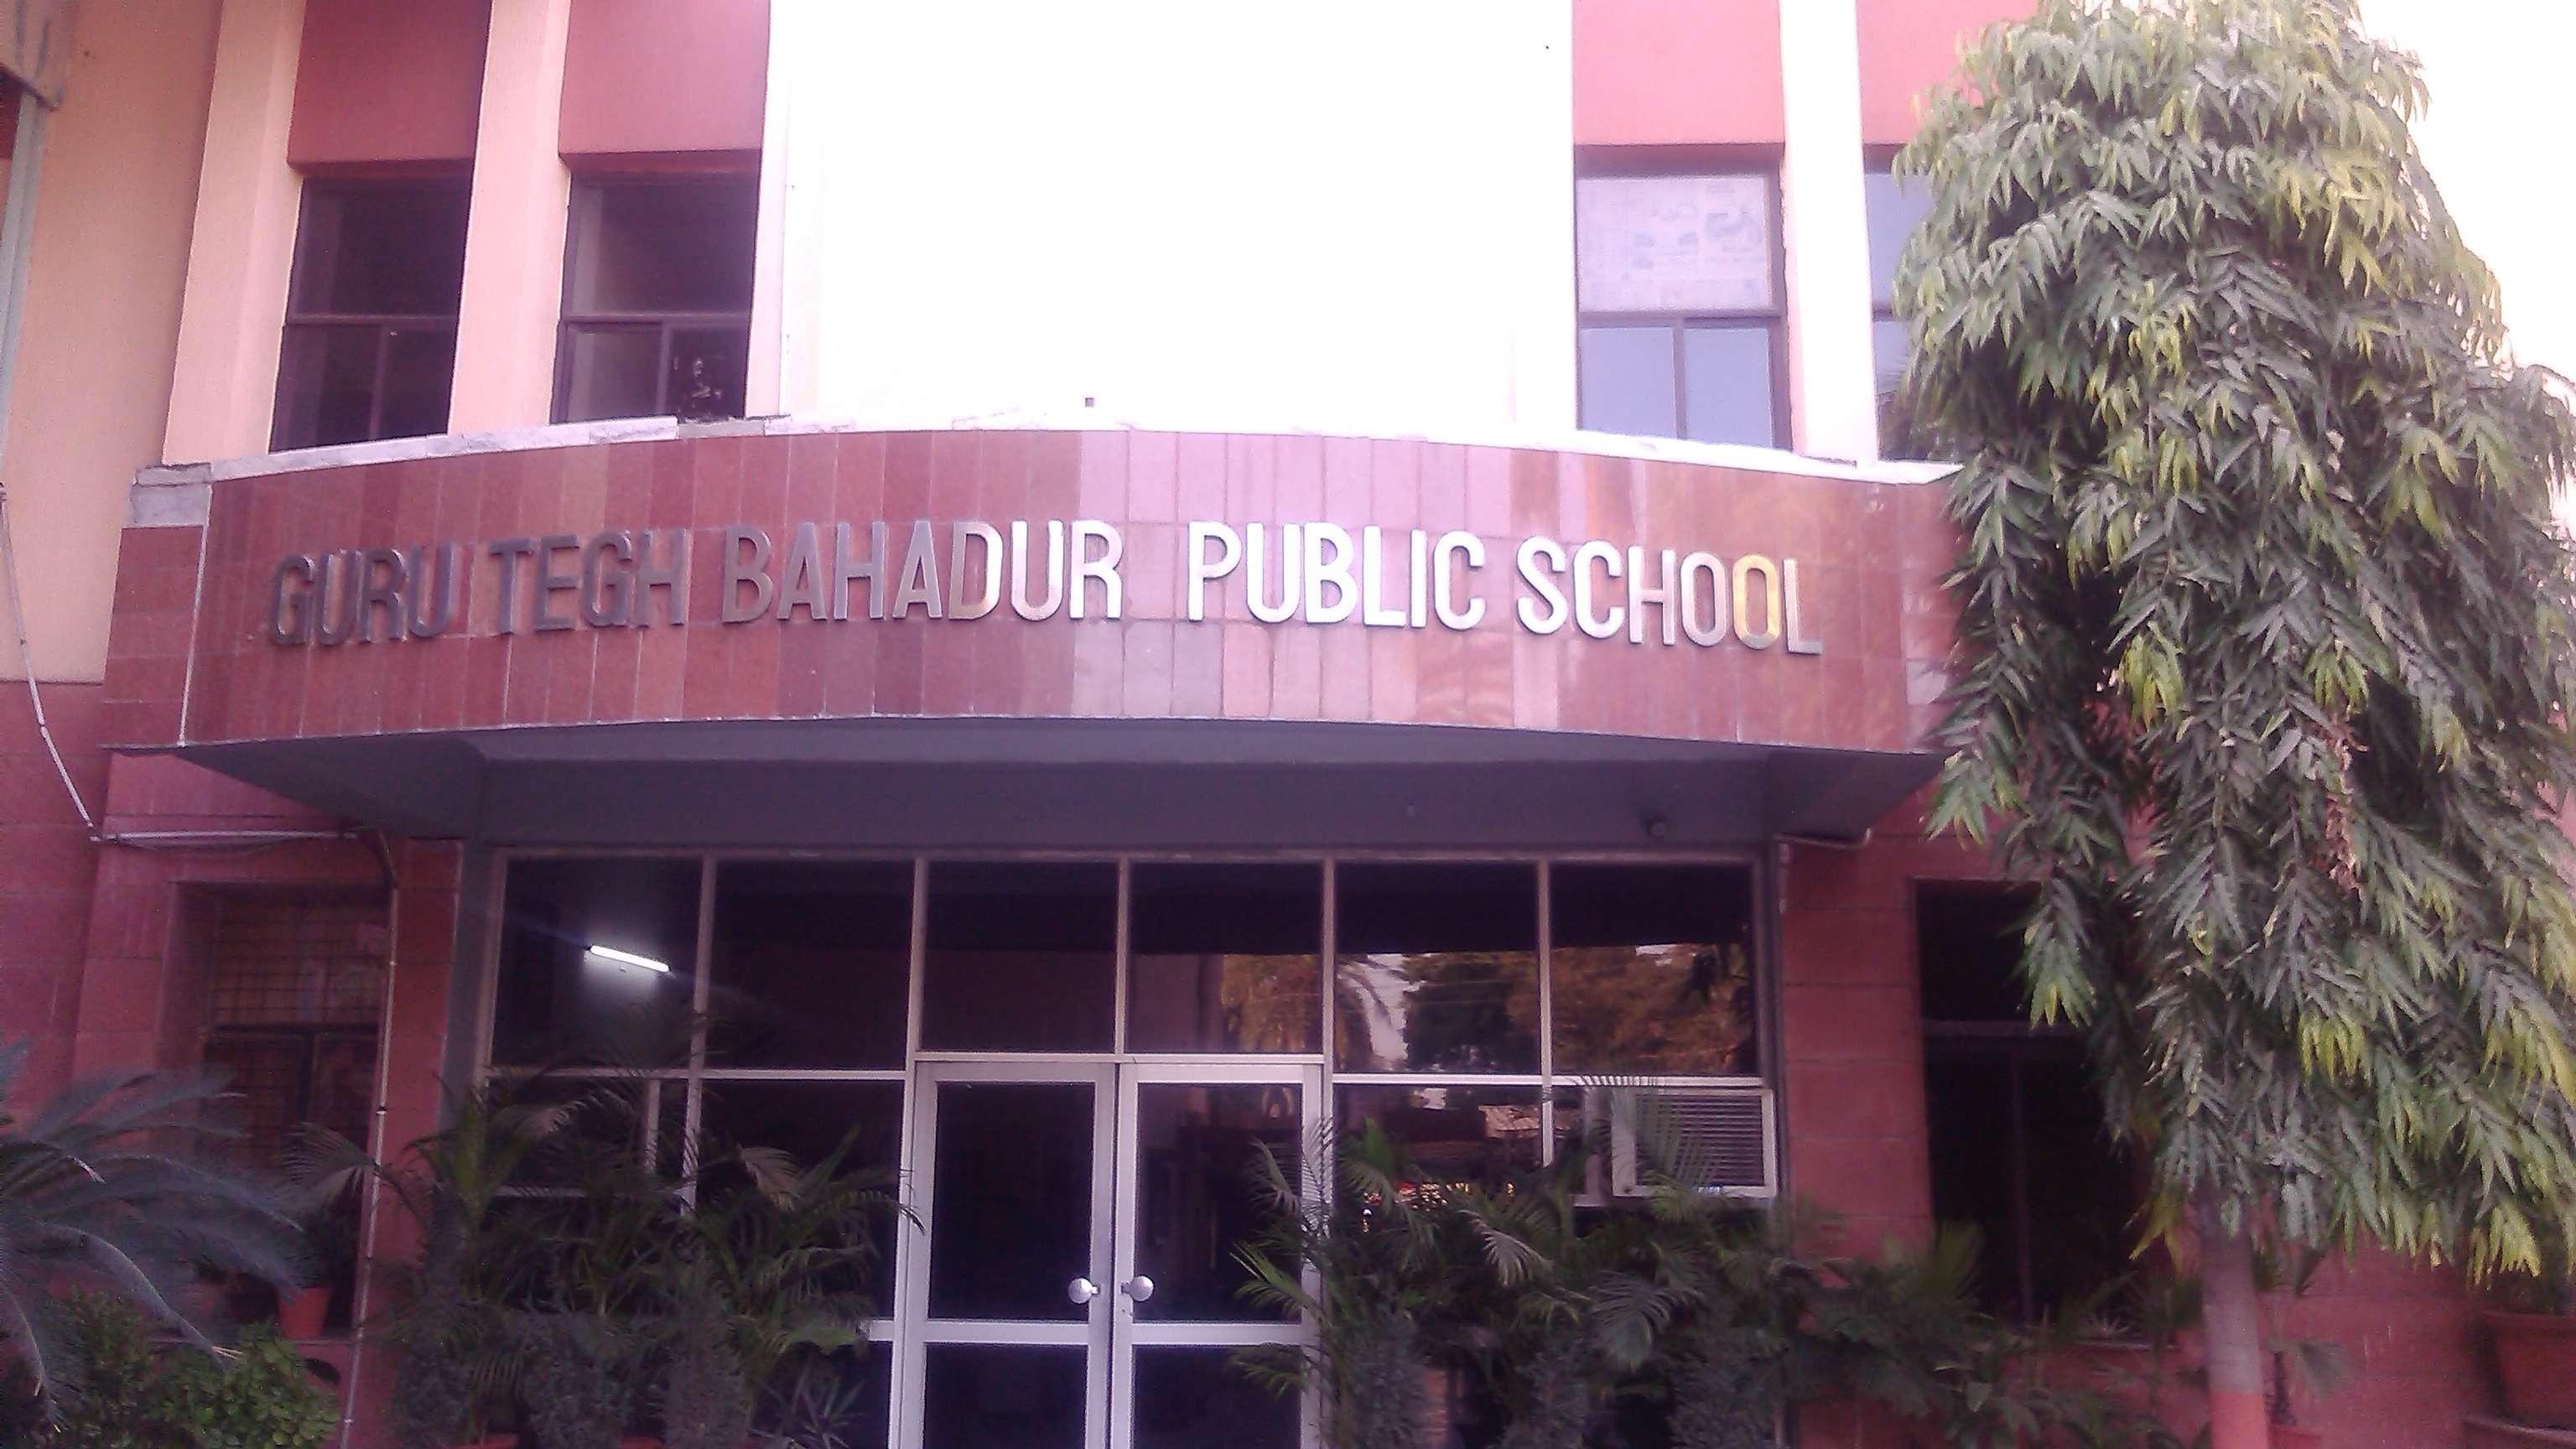 GURU TEGH BAHADUR PUBLIC SCHOOL 227 WEST END ROAD MEERUT CANTT UTTAR PRADESH 2130026